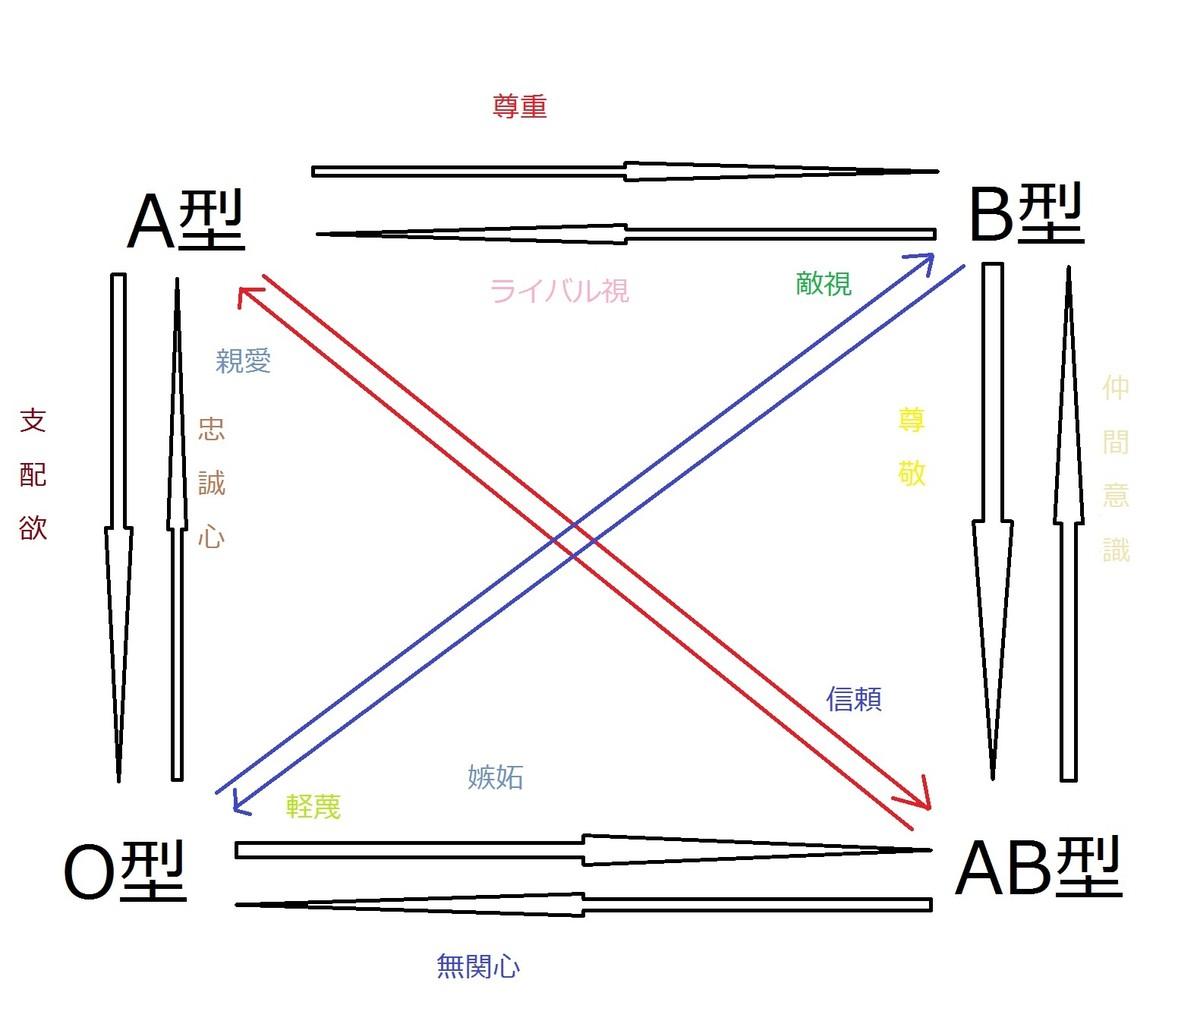 【A型B型】 血液型総合スレ 42【O型AB型】 [無断転載禁止]©2ch.net YouTube動画>21本 dailymotion>1本 ->画像>92枚